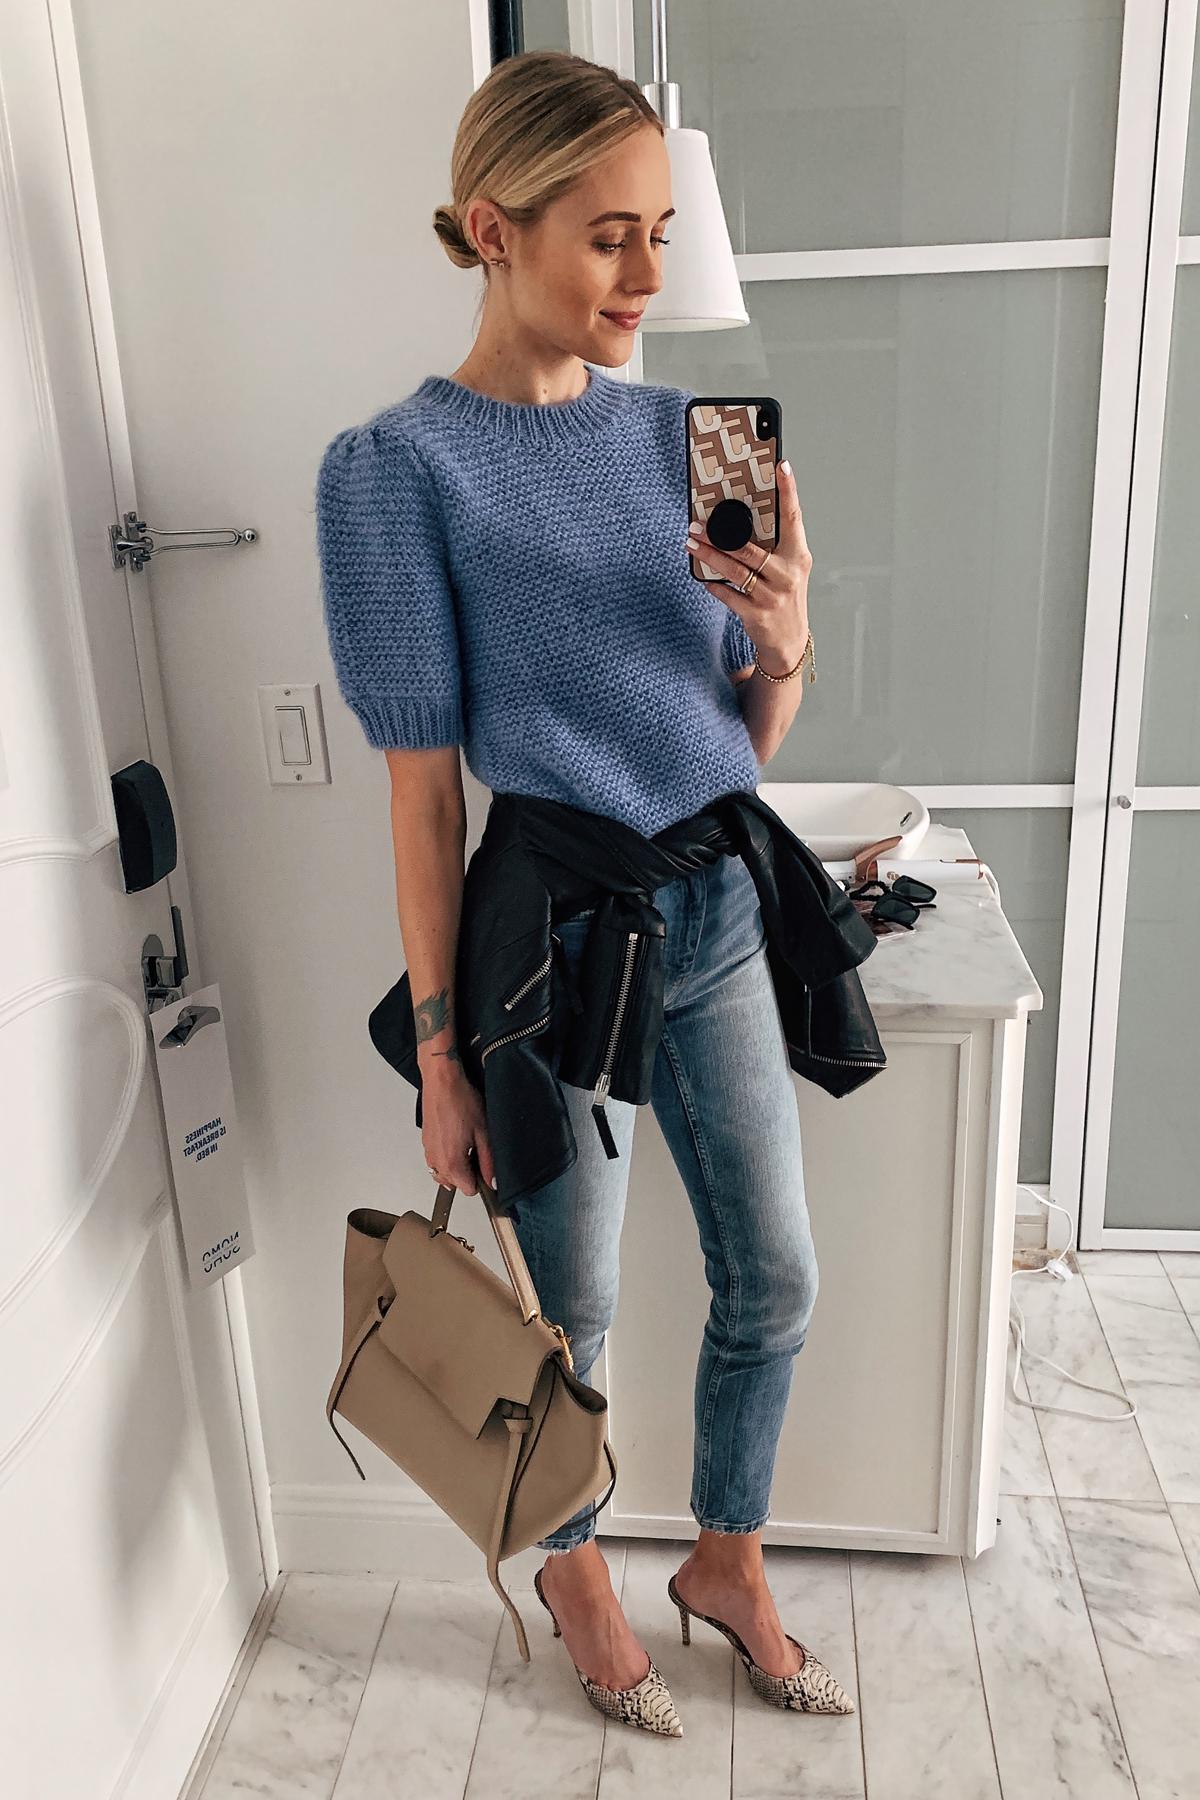 Fashion Jackson Wearing Anine Bing Blue Sweater Denim Skinny Jeans Black Leather Jacket Snakeskin Pumps Celine Mini Belt Bag